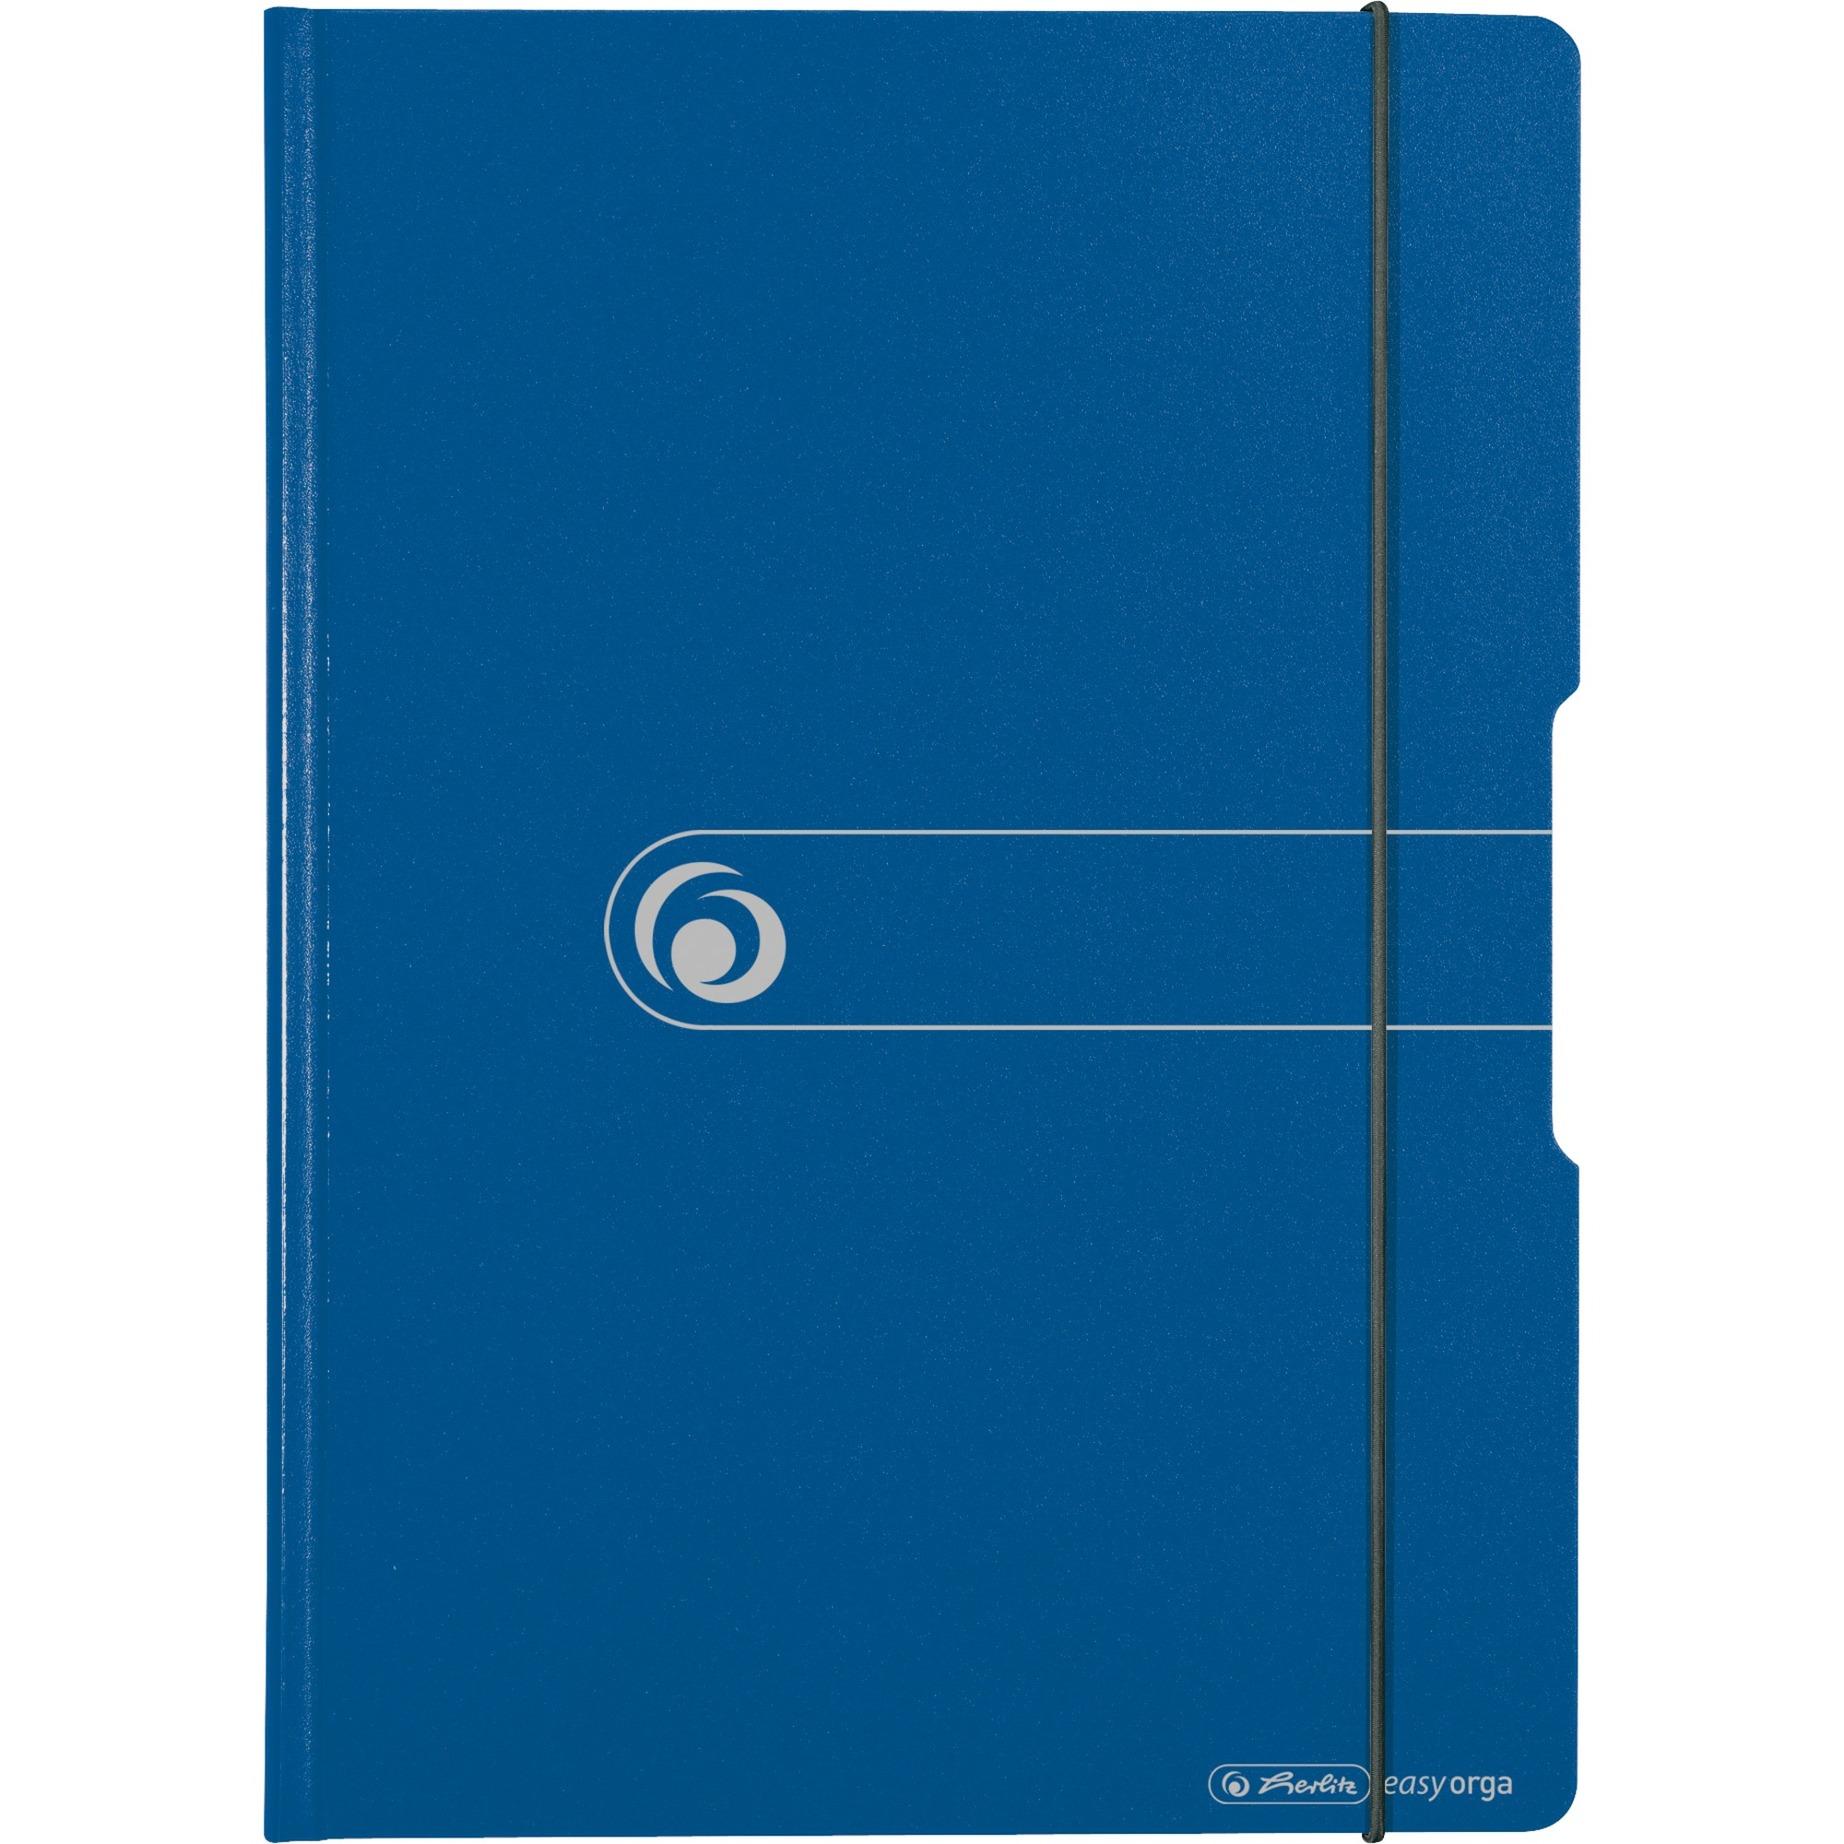 11217213 Azul portapapel, Tablero de bornes